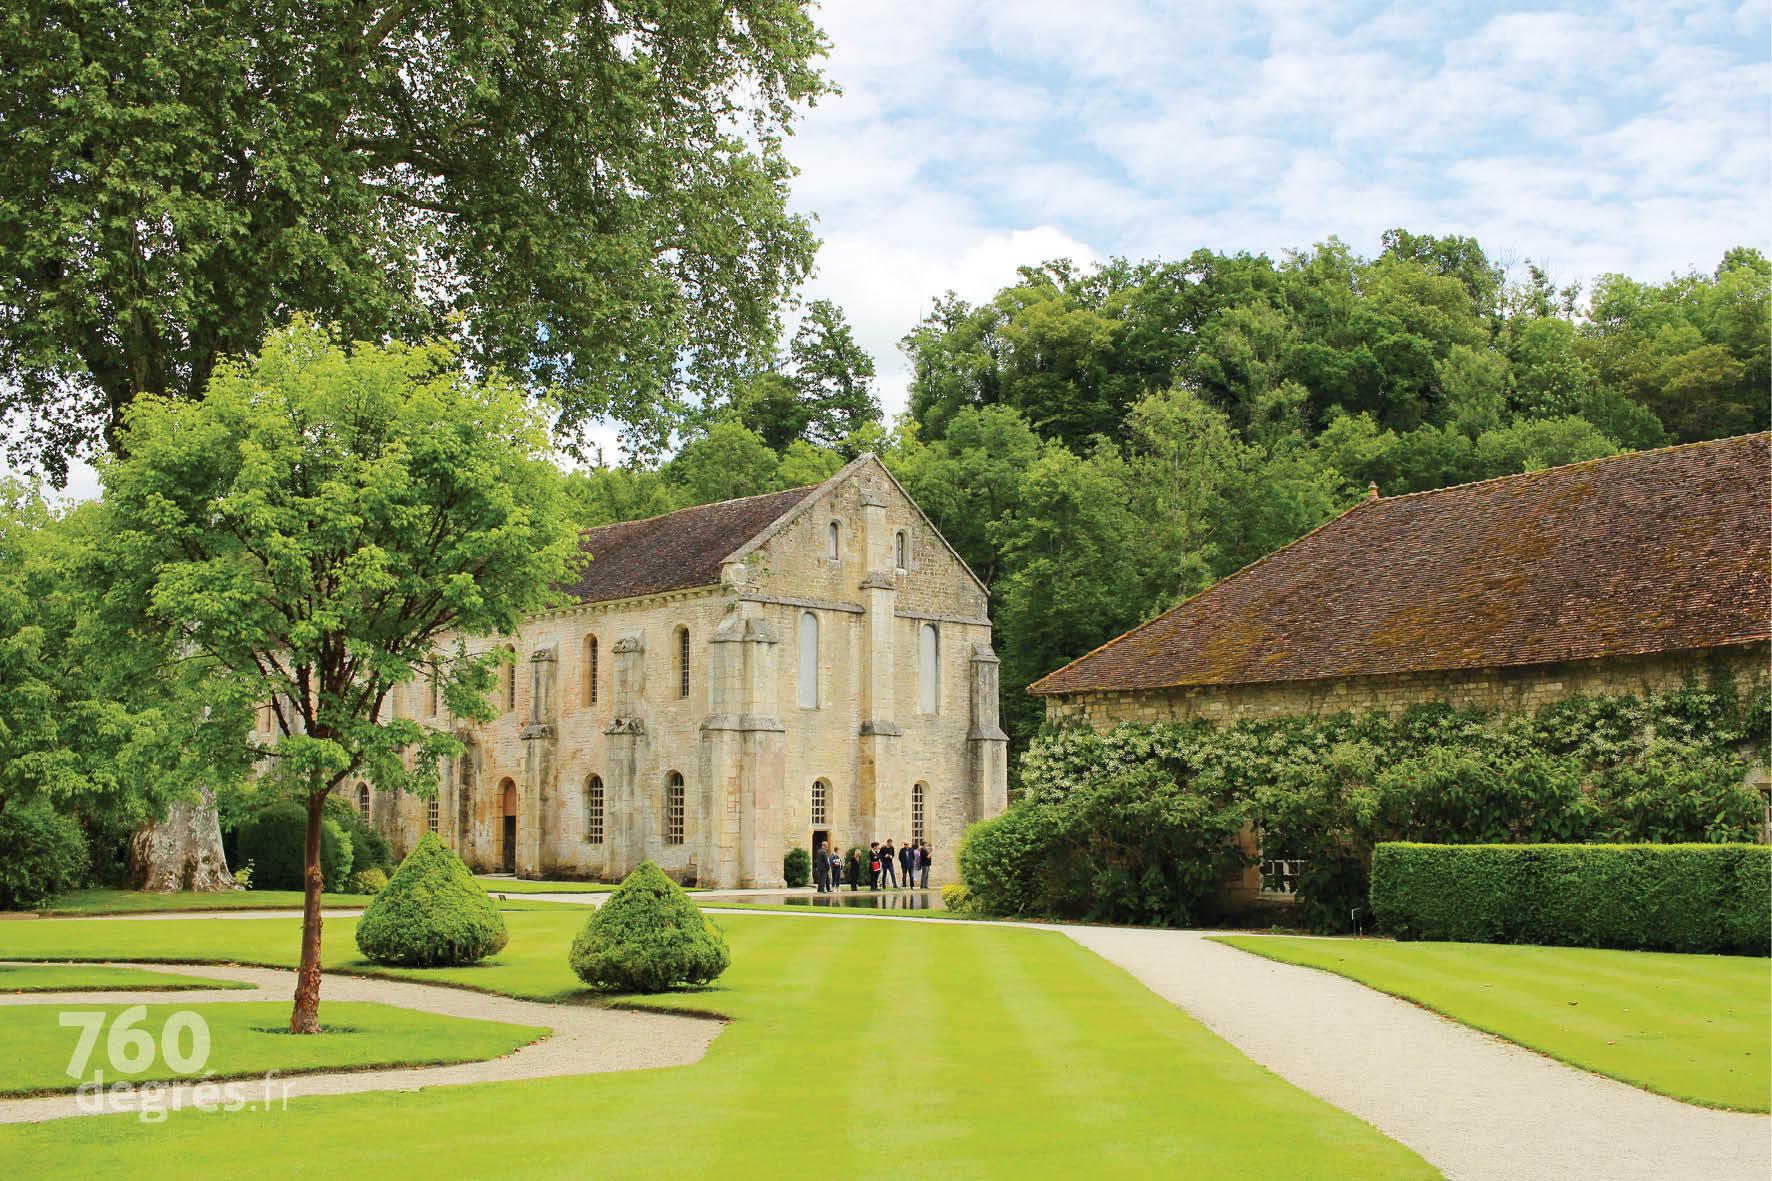 760degres-abbaye-fontenay-18